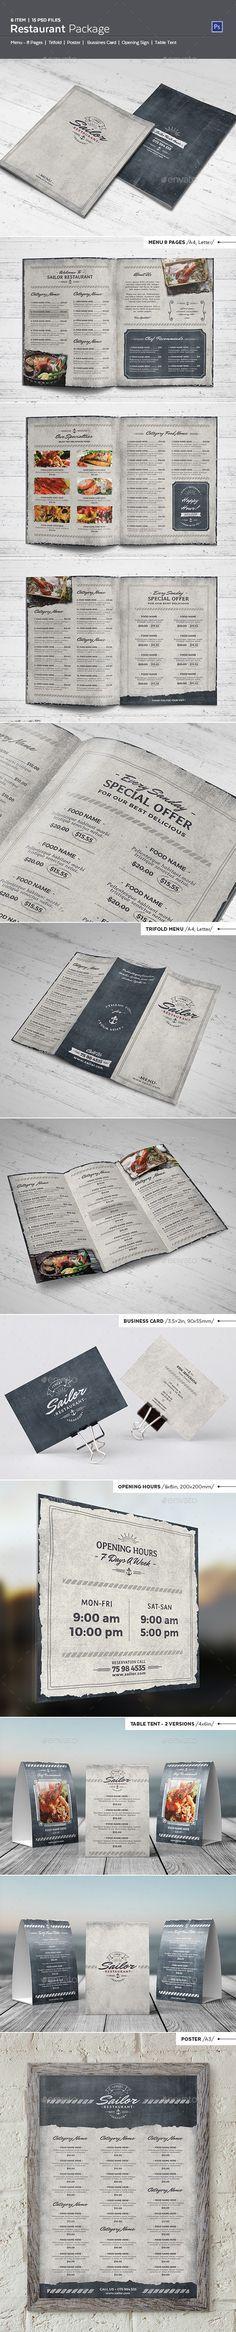 Sailor Restaurant Package Menu PSD Template #design Download: http://graphicriver.net/item/sailor-restaurant-package/13046237?ref=ksioks